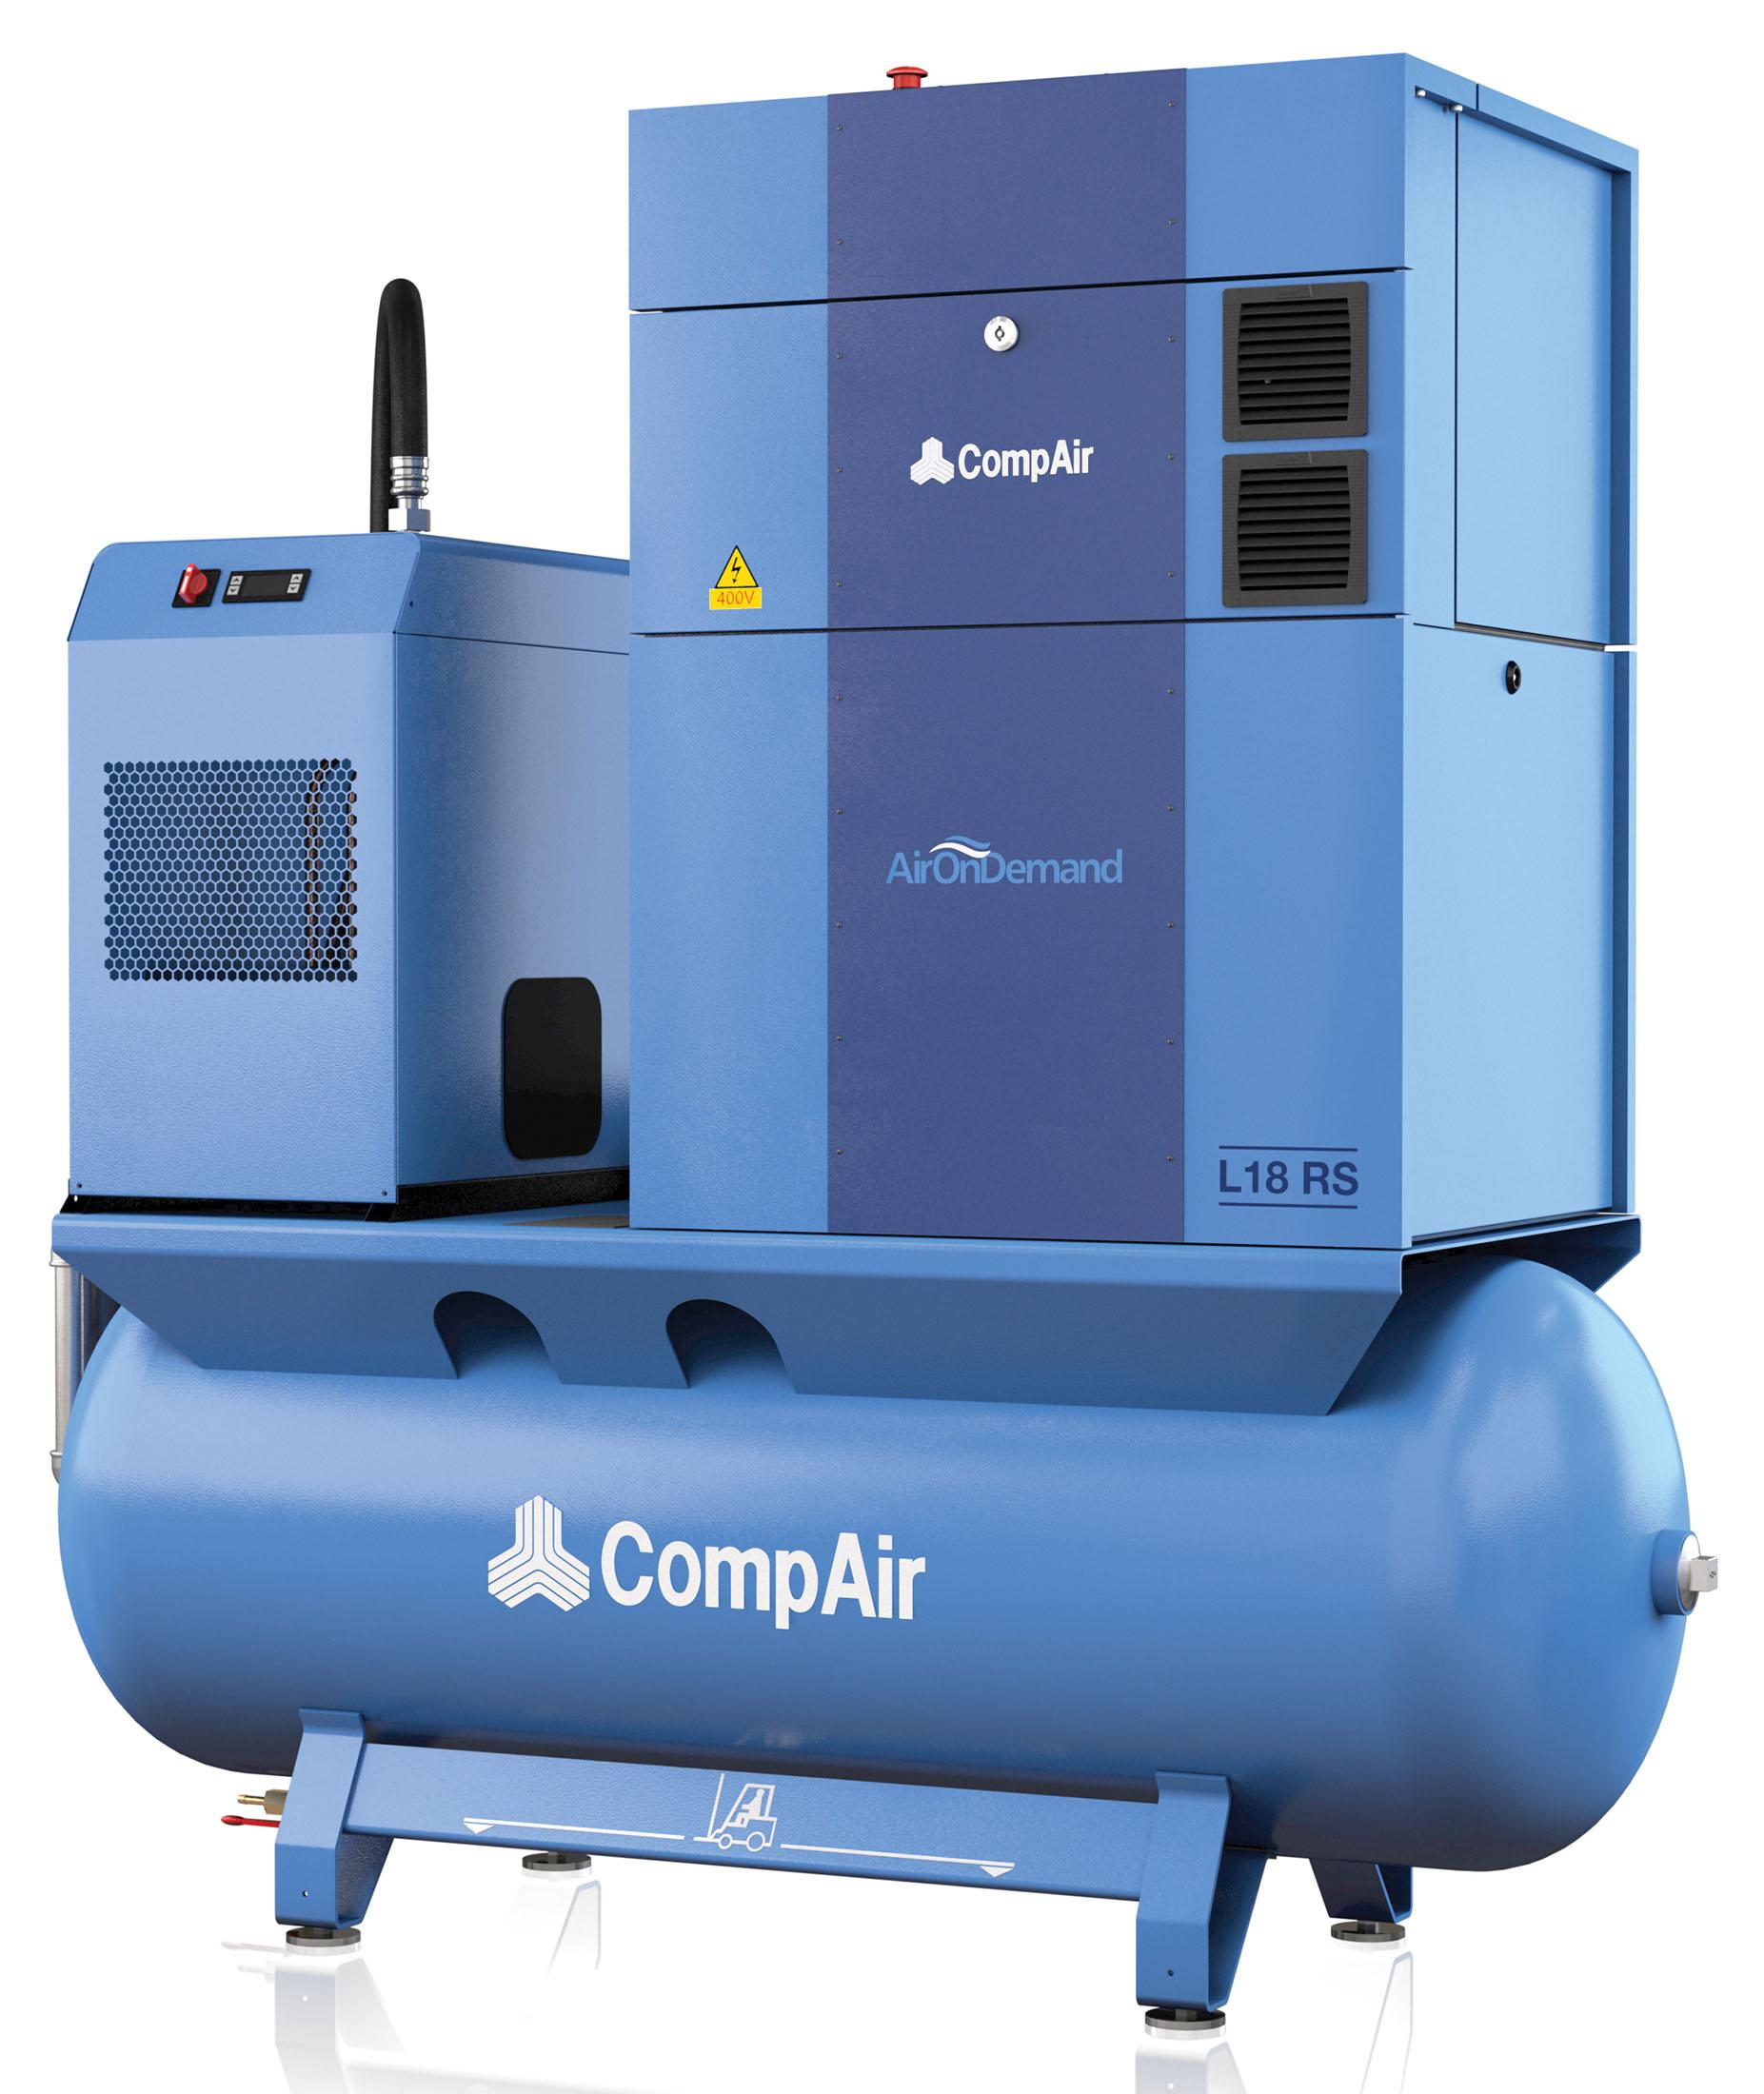 Midlands UK supplier of CompAir L18RS AirStation air compressor